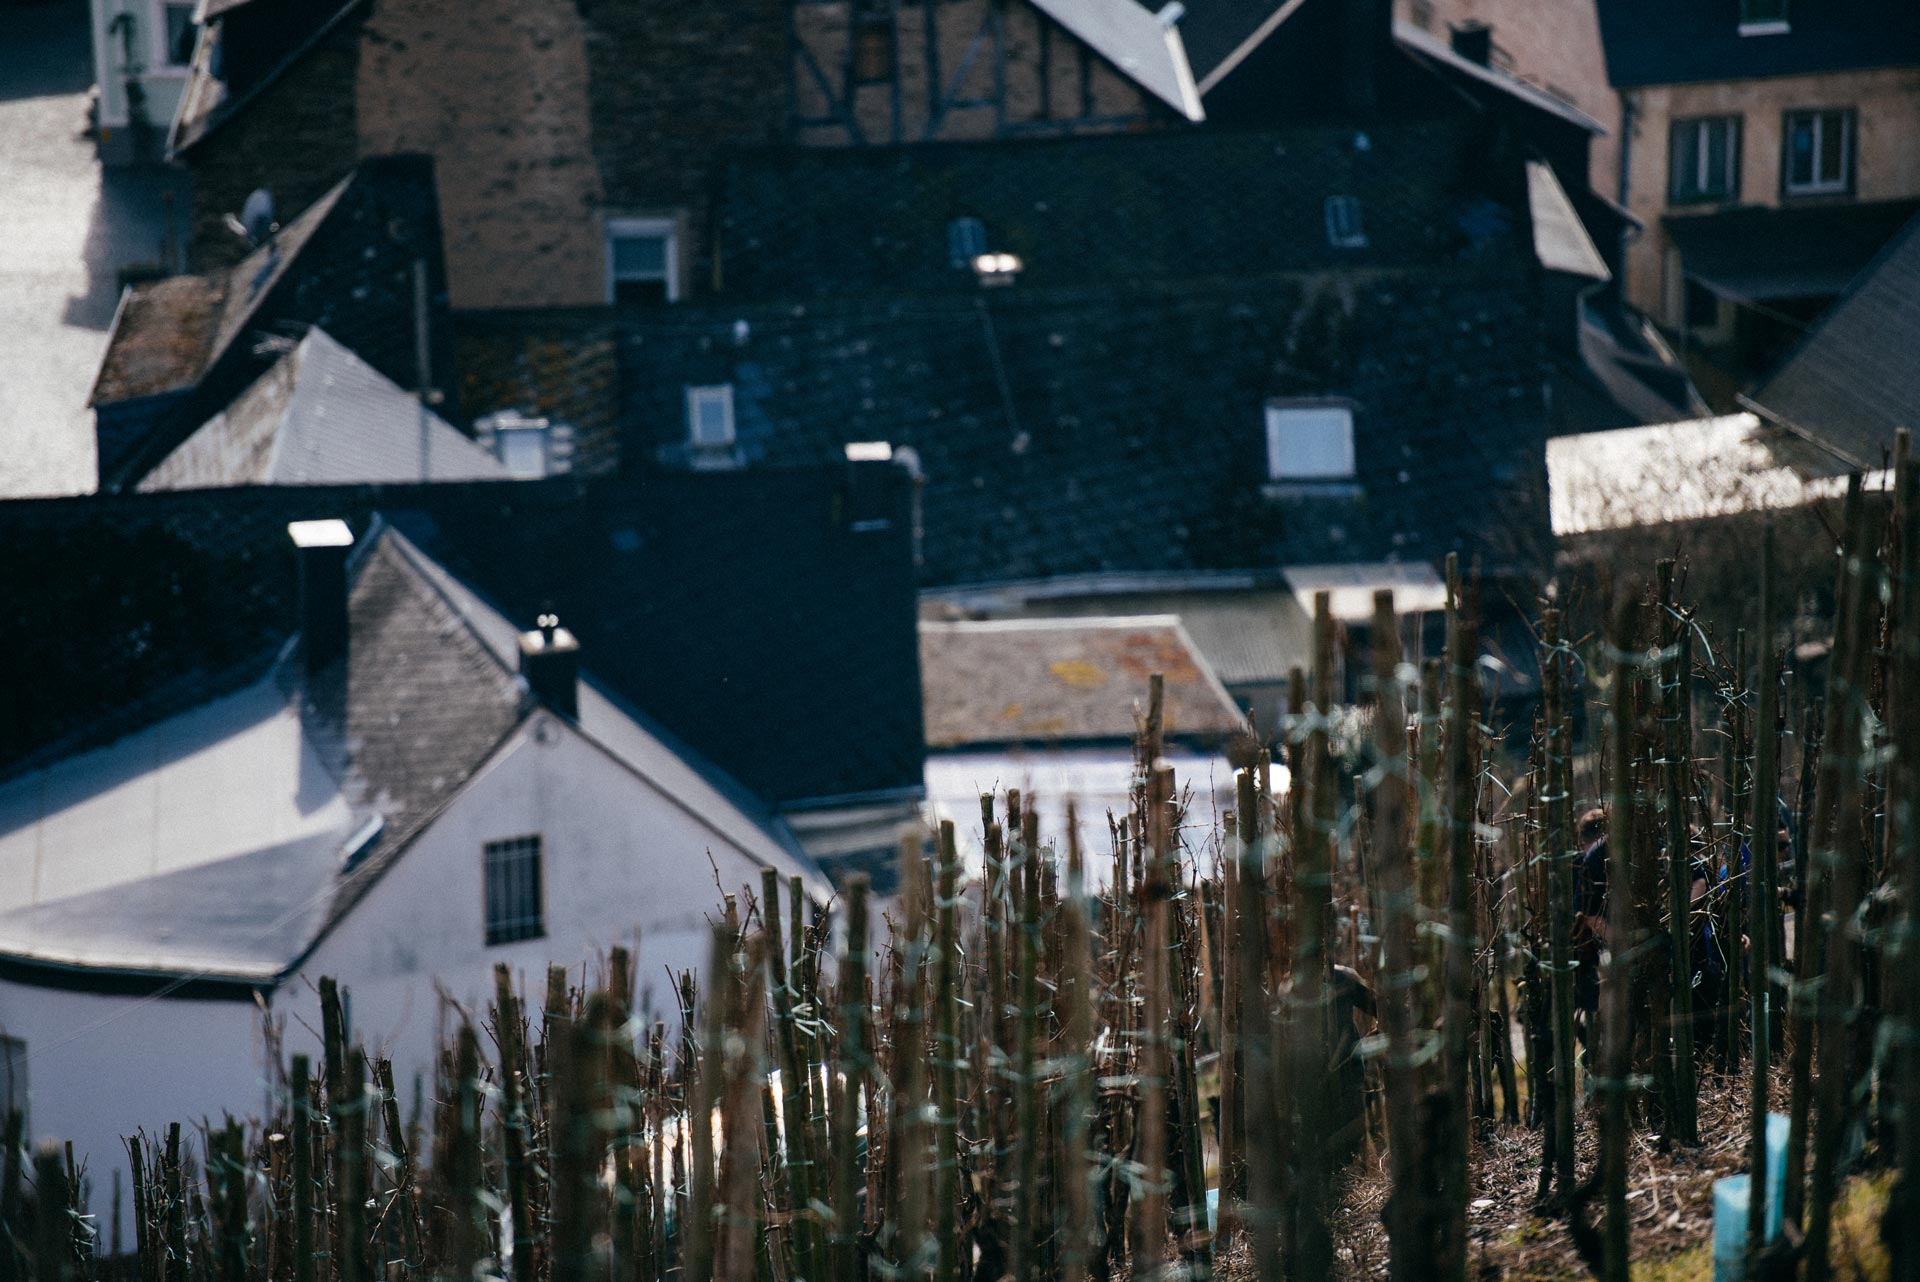 Vigneto Shmitt, Selbach Oster, Mosel, Germany